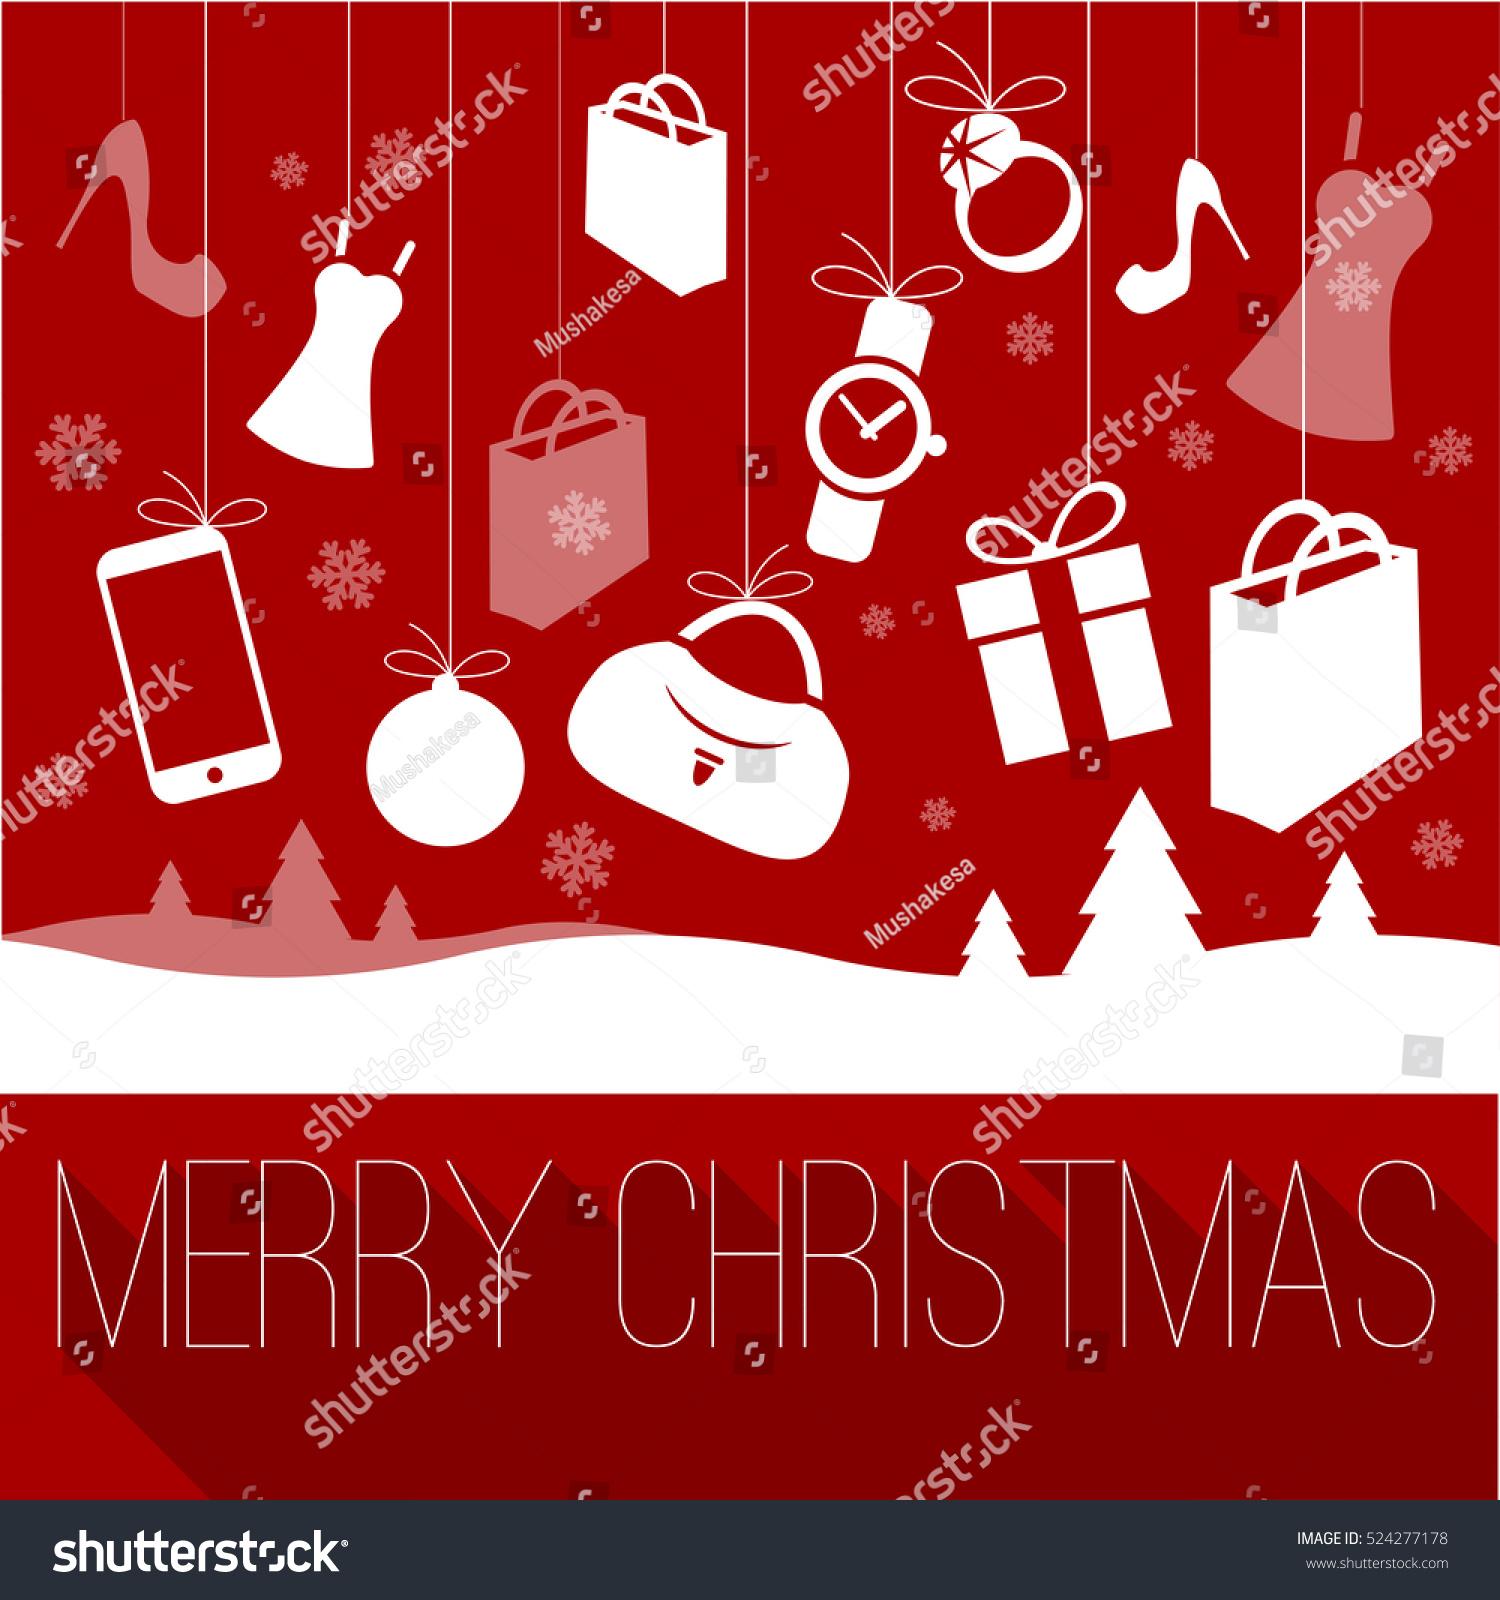 Christmas New Year Shopping Greeting Card Stock Vector (Royalty Free ...